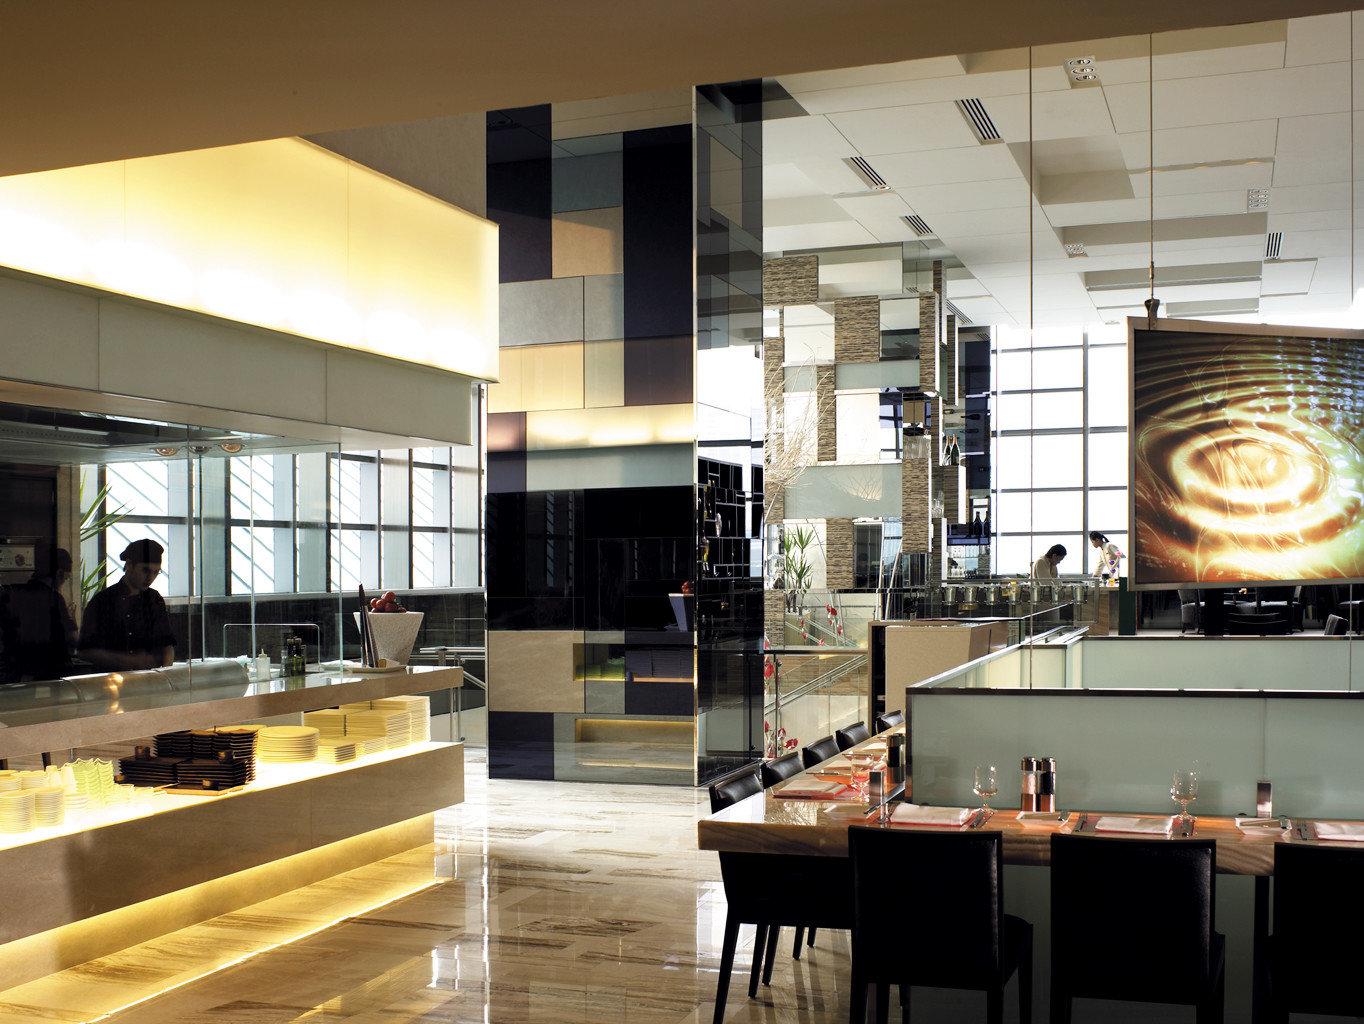 Bar Drink Eat Elegant Modern Kitchen Lobby Architecture lighting condominium professional cabinetry Island